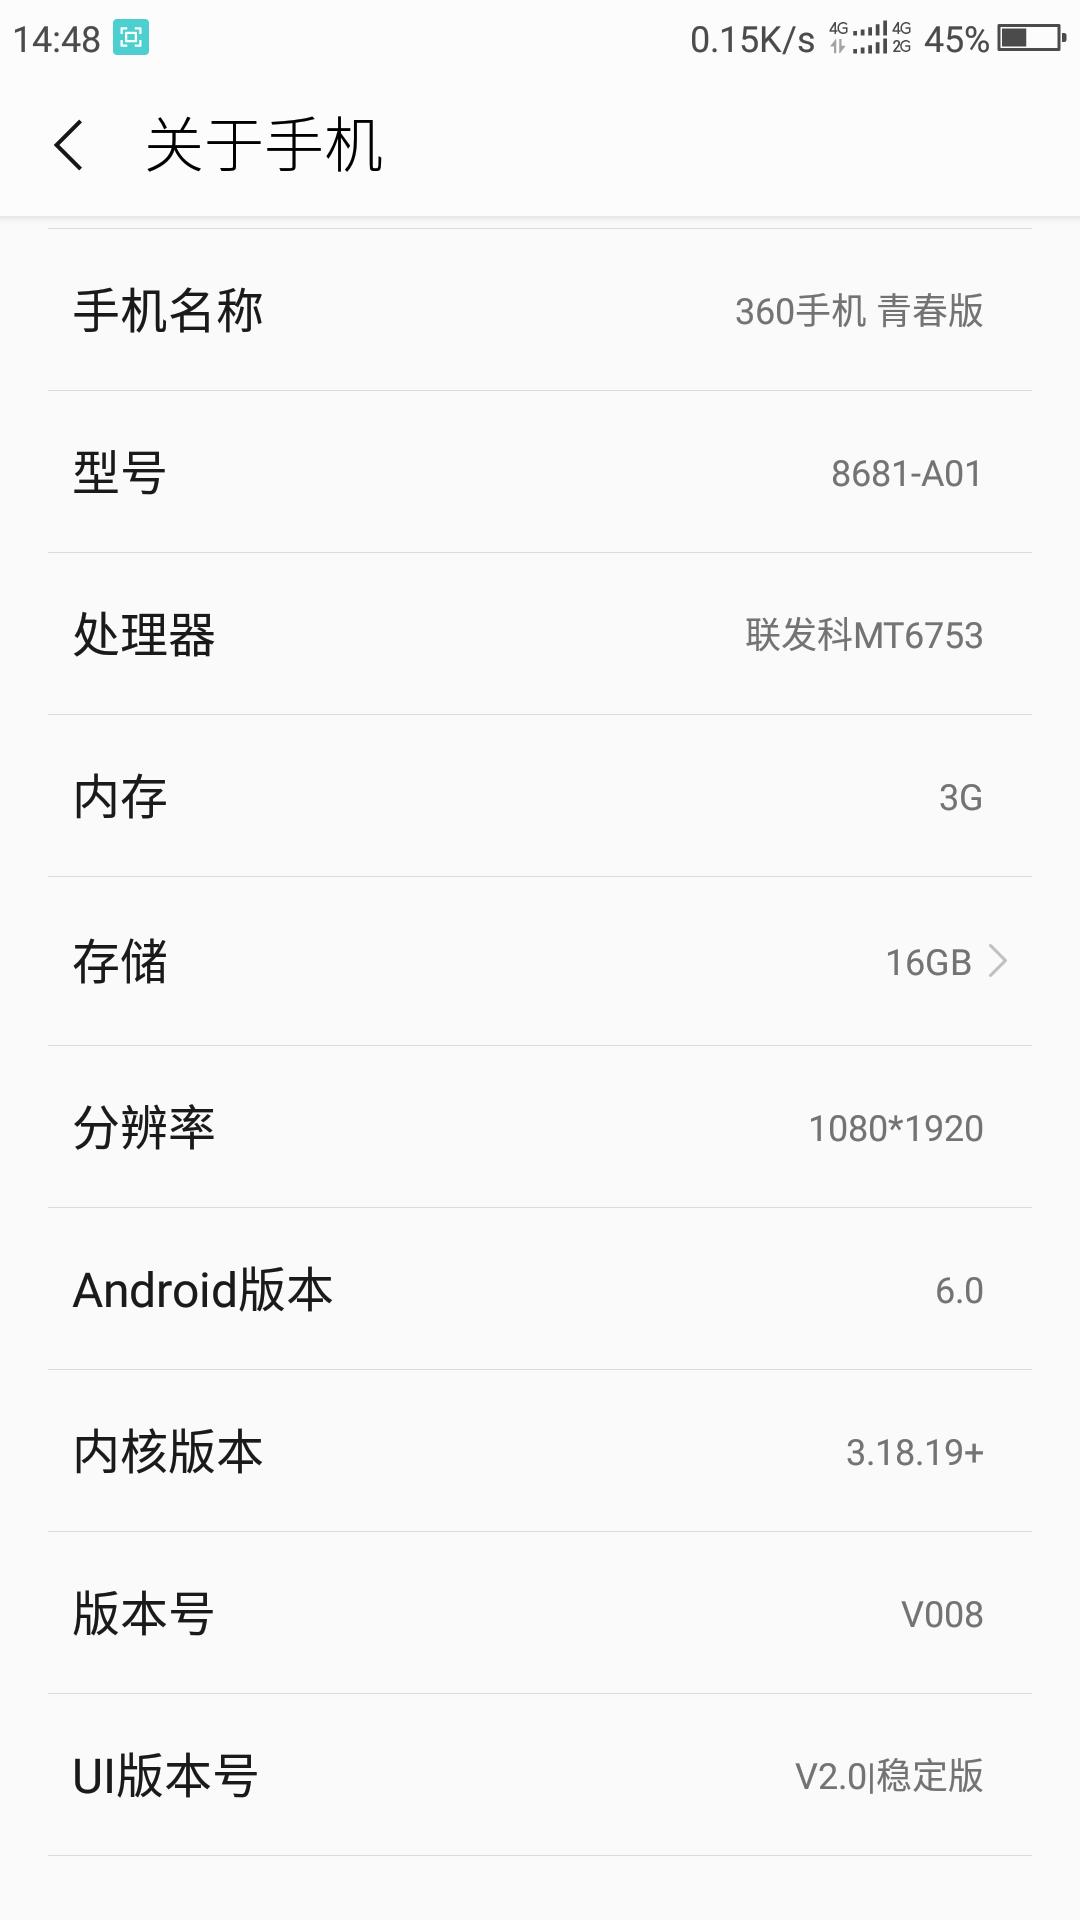 Screenshot_2020-01-20-14-48-28.png